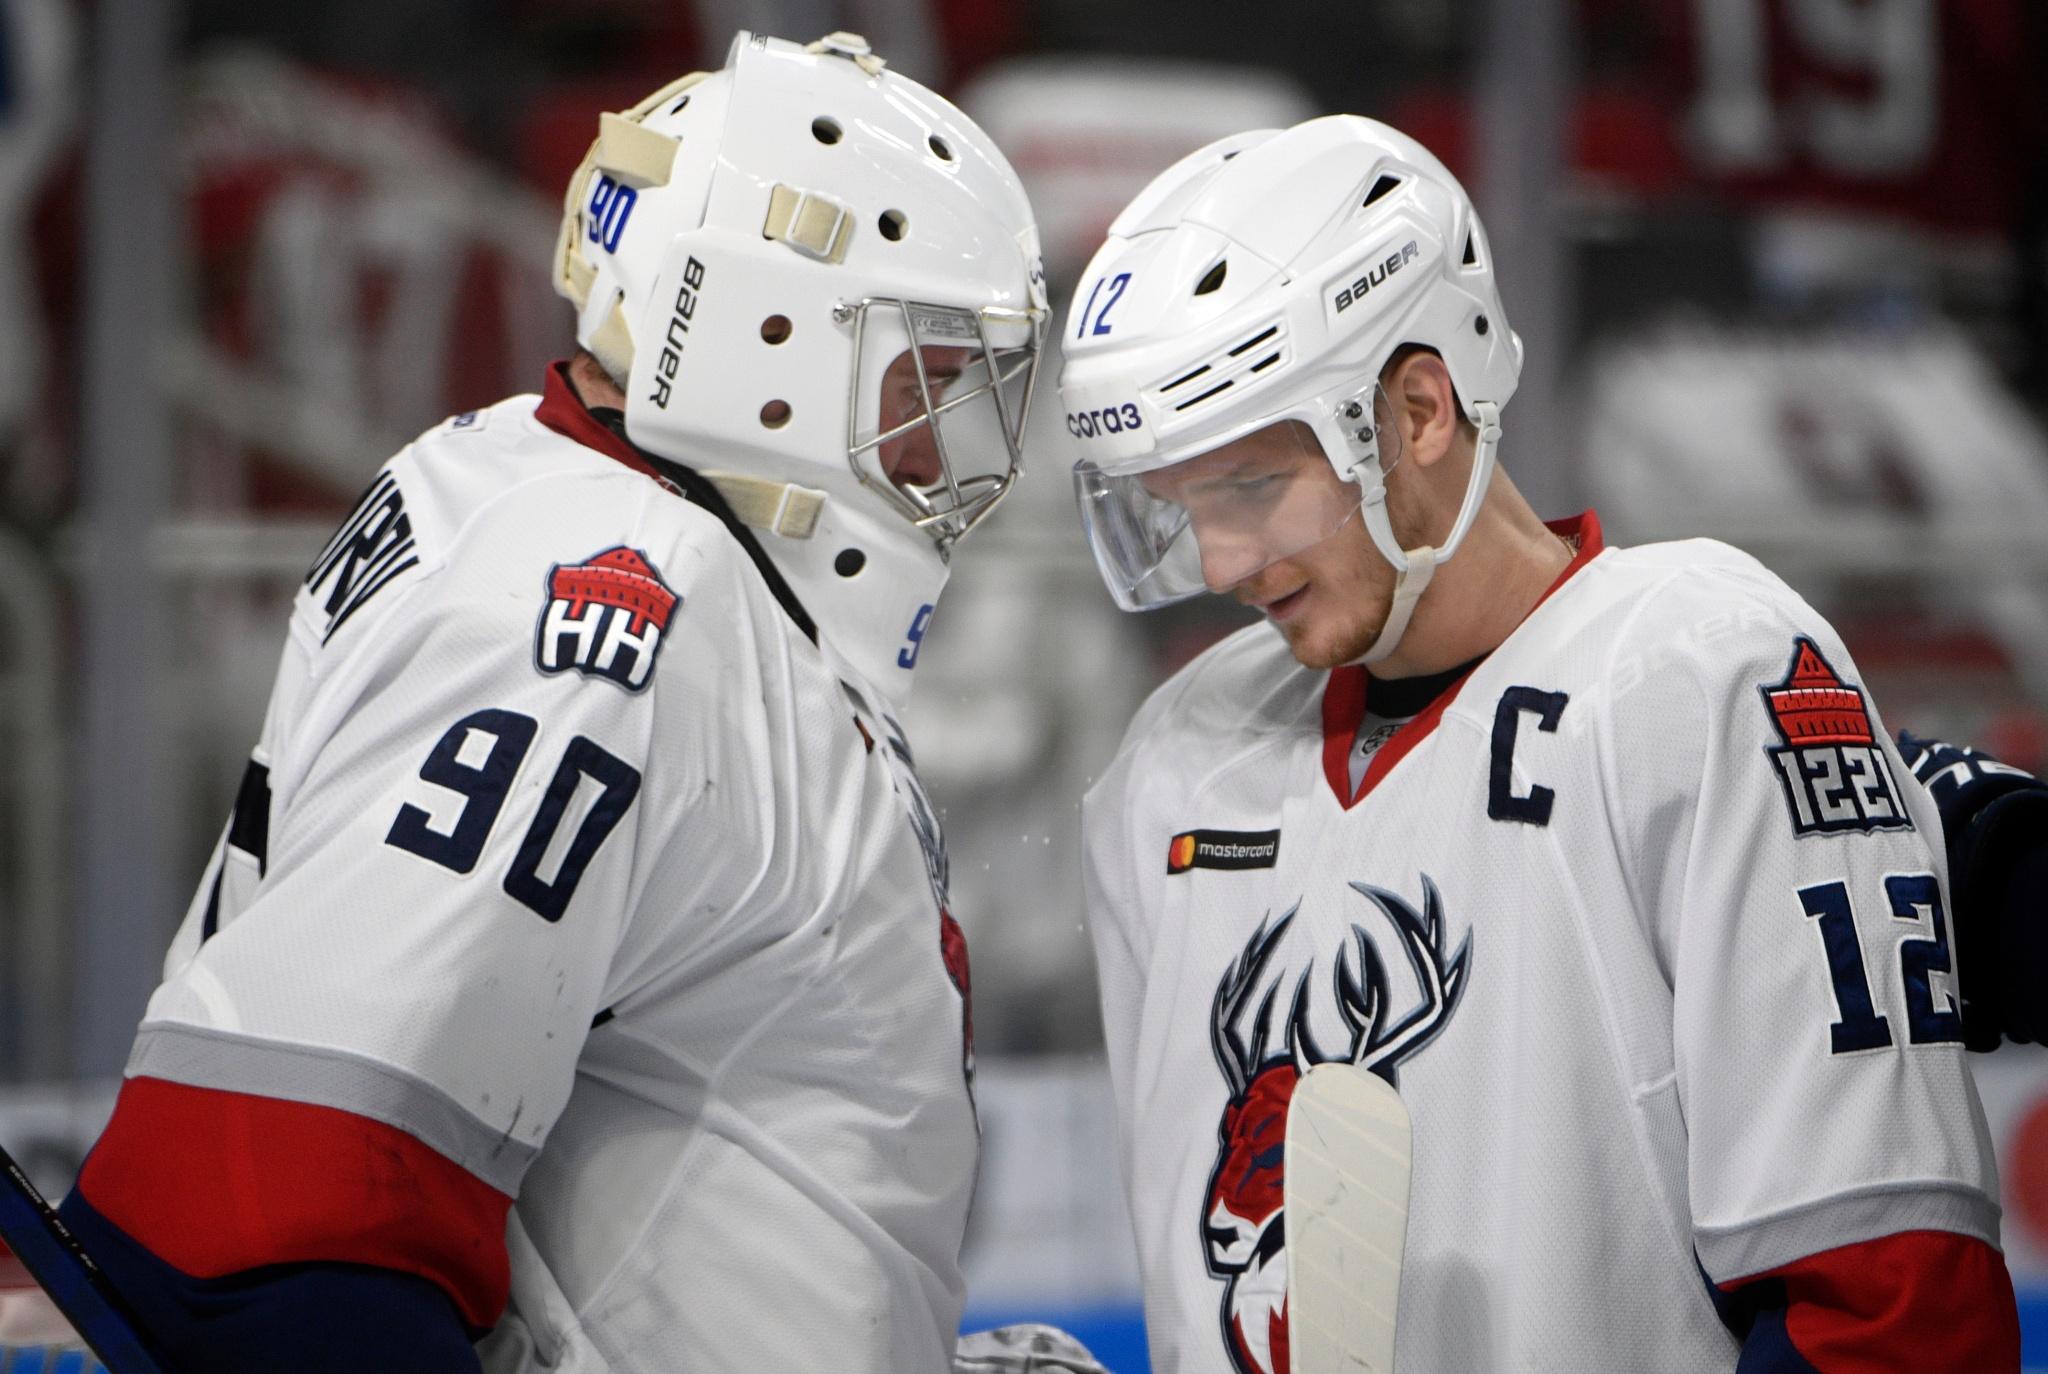 Андрей Тихомиров и Антон Шенфельд. Фото: Роман Кокшаров